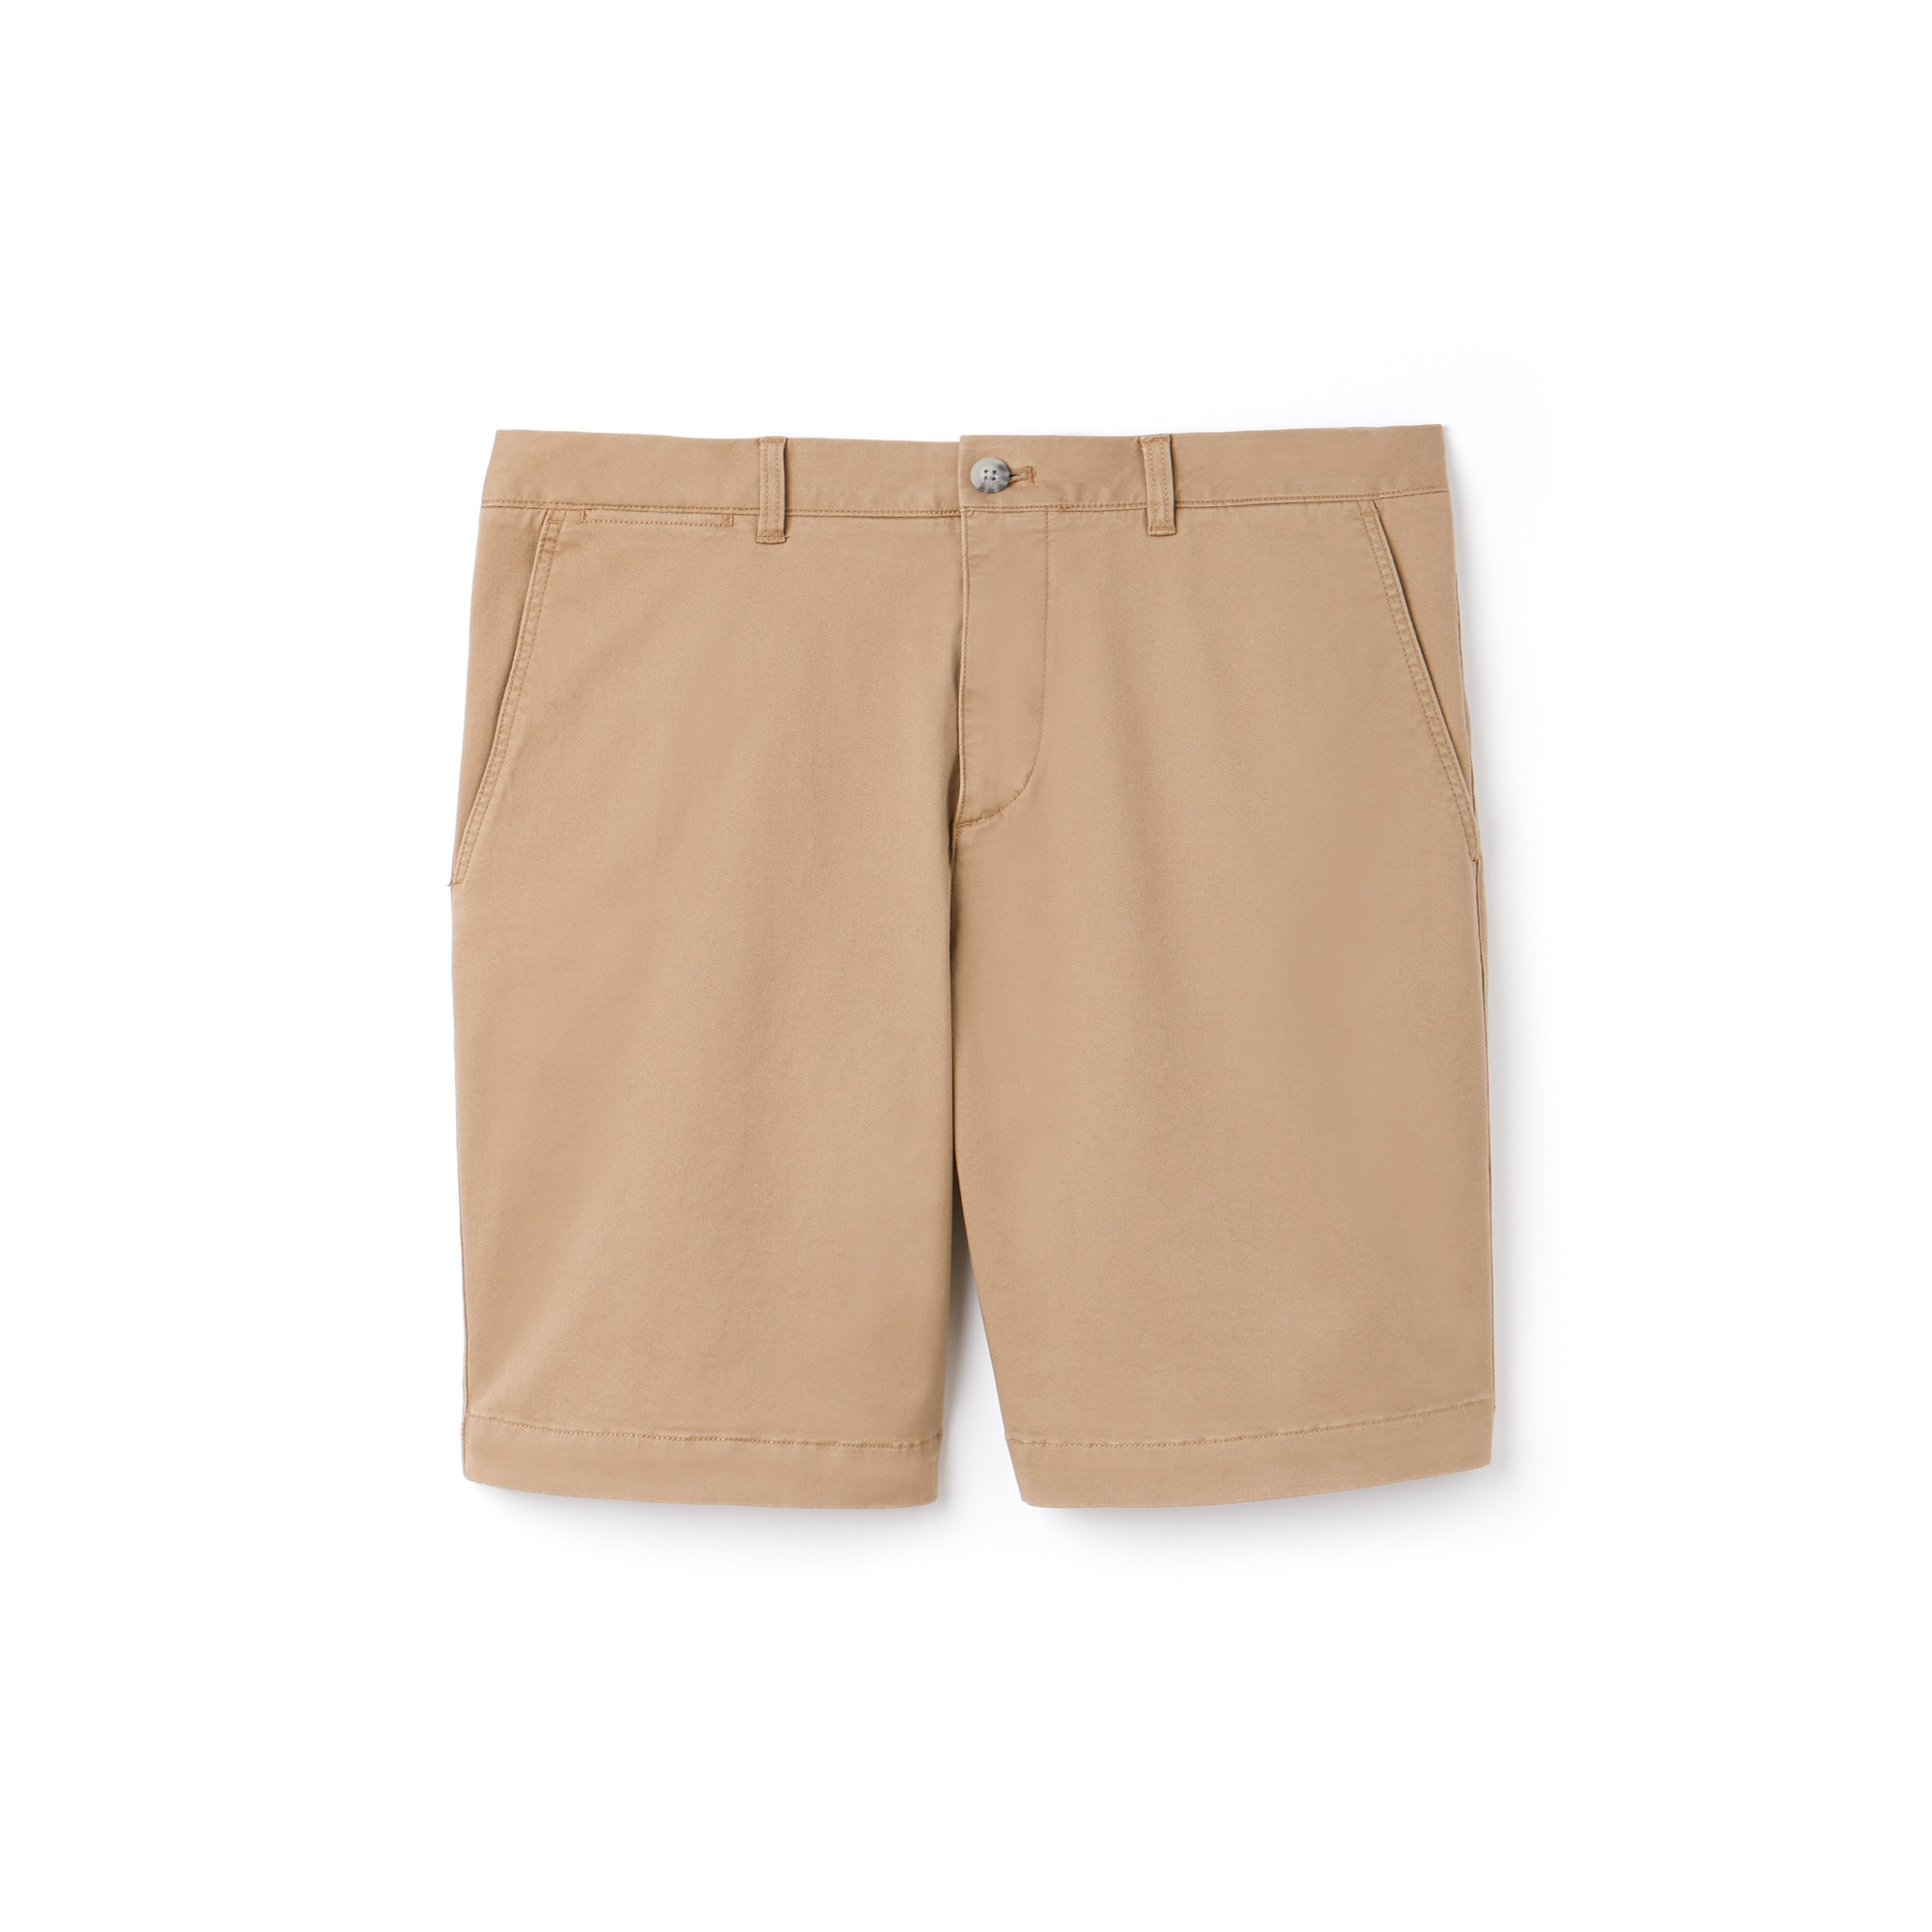 Pantalonsamp; Bermudas Bermudas HommeLacoste HommeLacoste Pantalonsamp; Pantalonsamp; Pantalonsamp; HommeLacoste Bermudas Bermudas HommeLacoste Pantalonsamp; WIH29ED